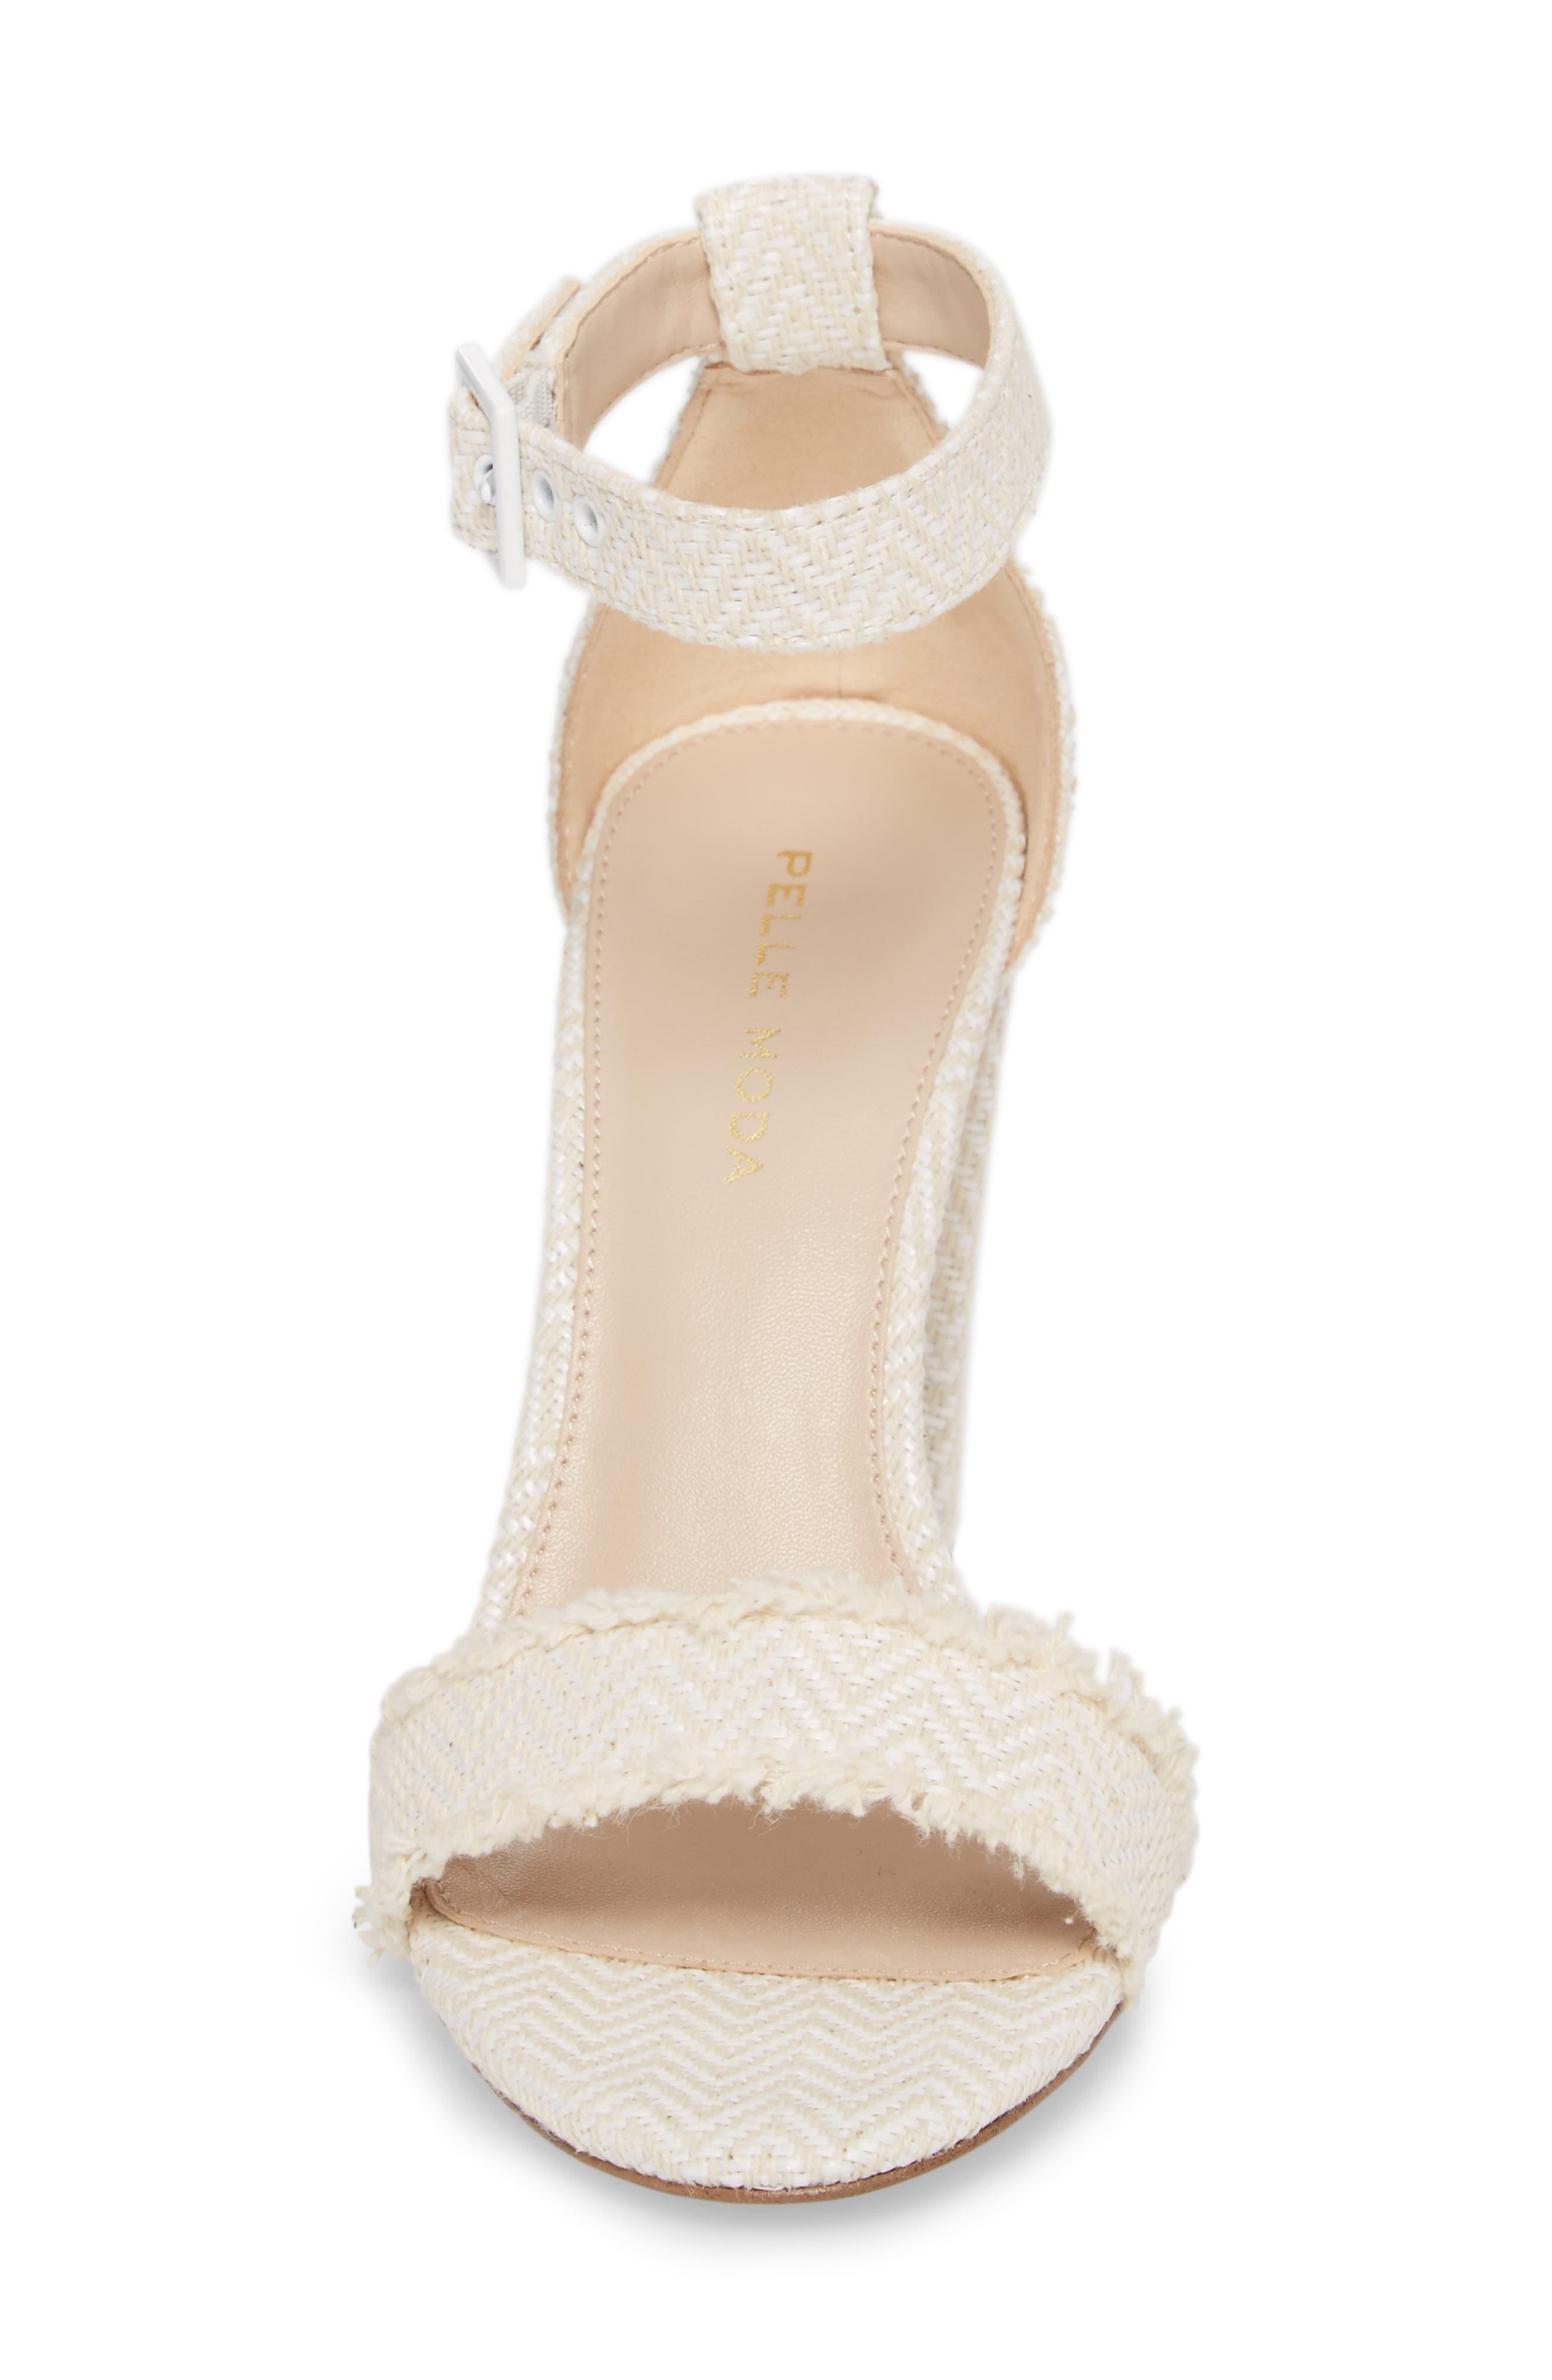 Bonnie Ankle Strap Sandal,                             Alternate thumbnail 4, color,                             White Herringbone